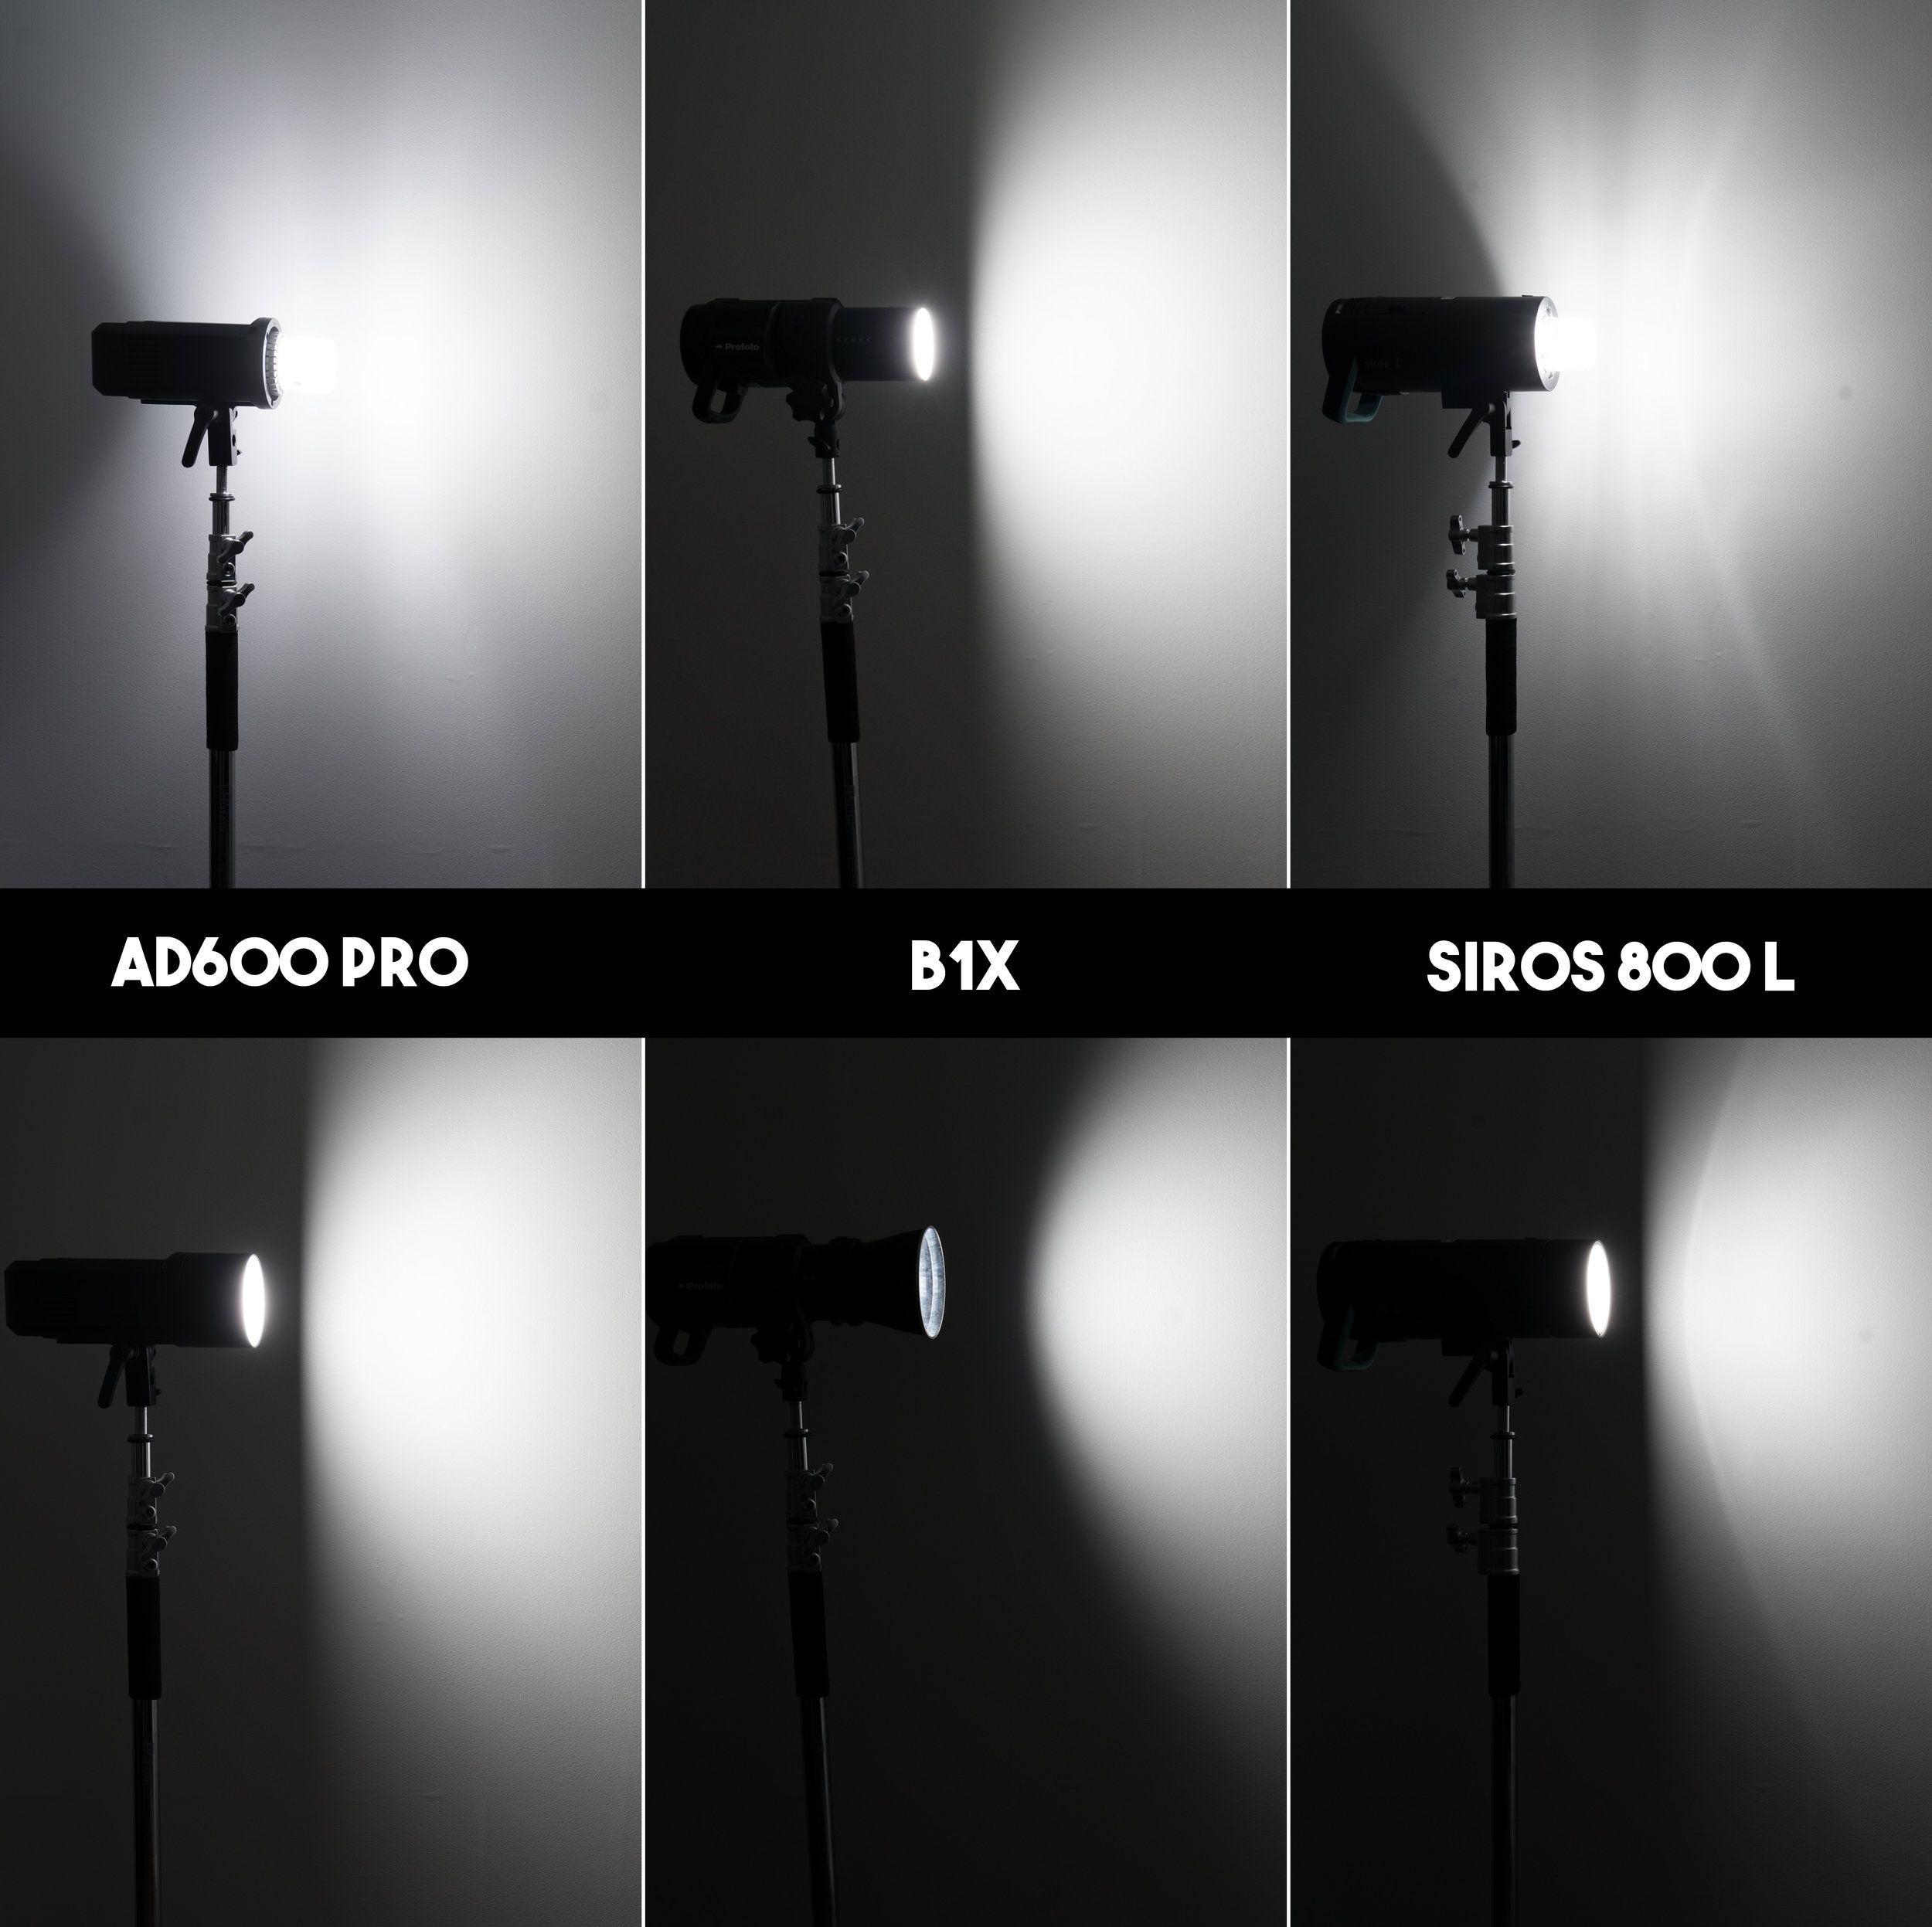 Broncolor Siros 800 L Vs Profoto B1x Vs Godox Ad600 Pro Aka Xplor 600 Pro Ttl Detroit Wedding Photography Profoto Strobe Lights Softbox